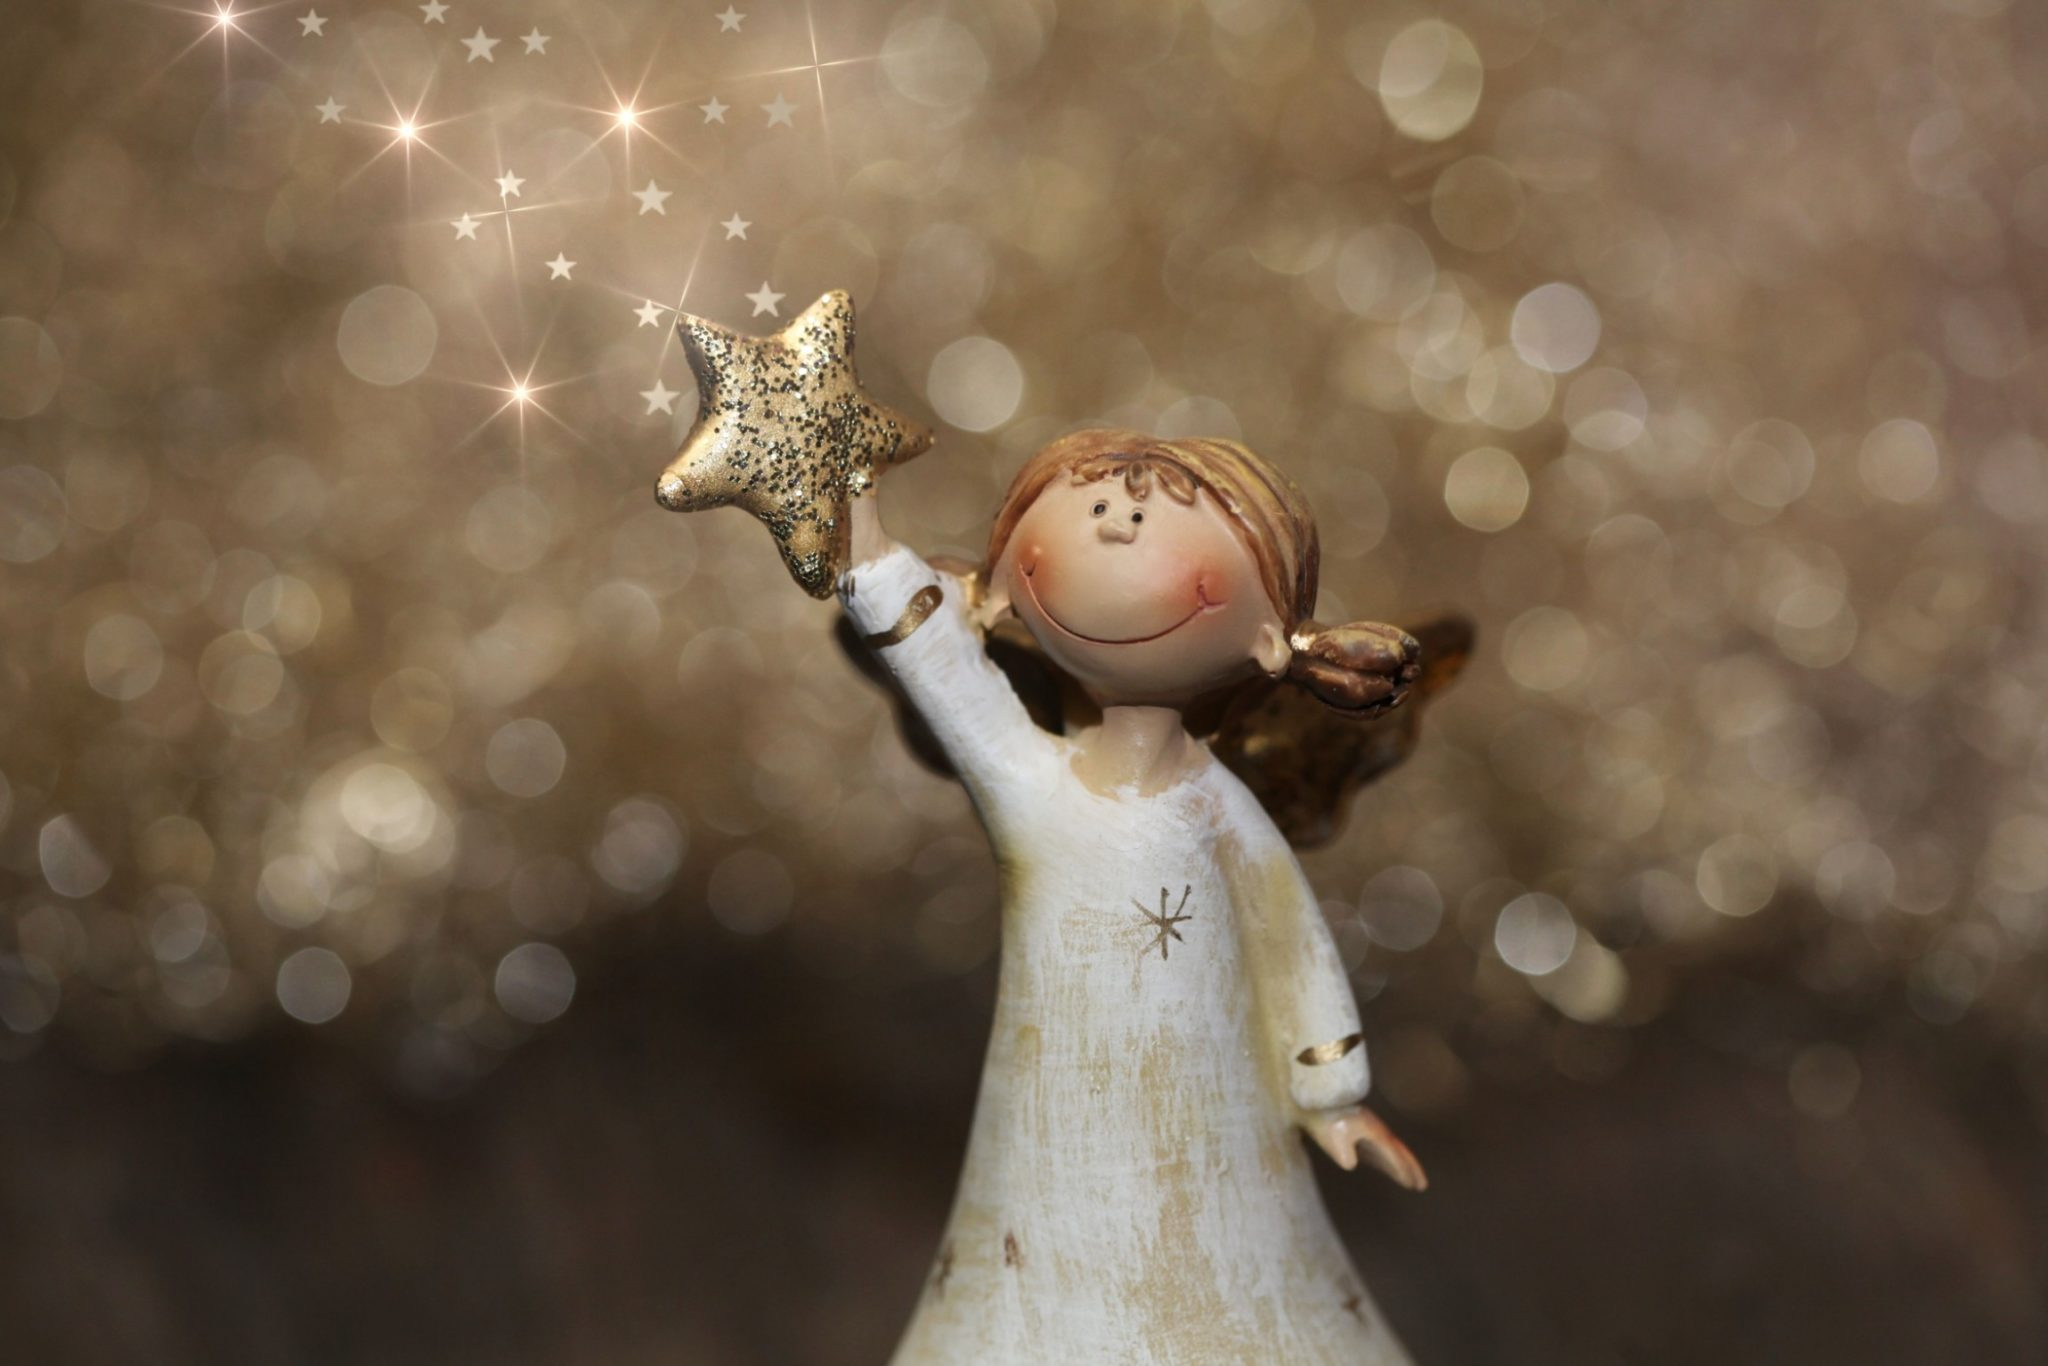 Angel in deklica -zgodba